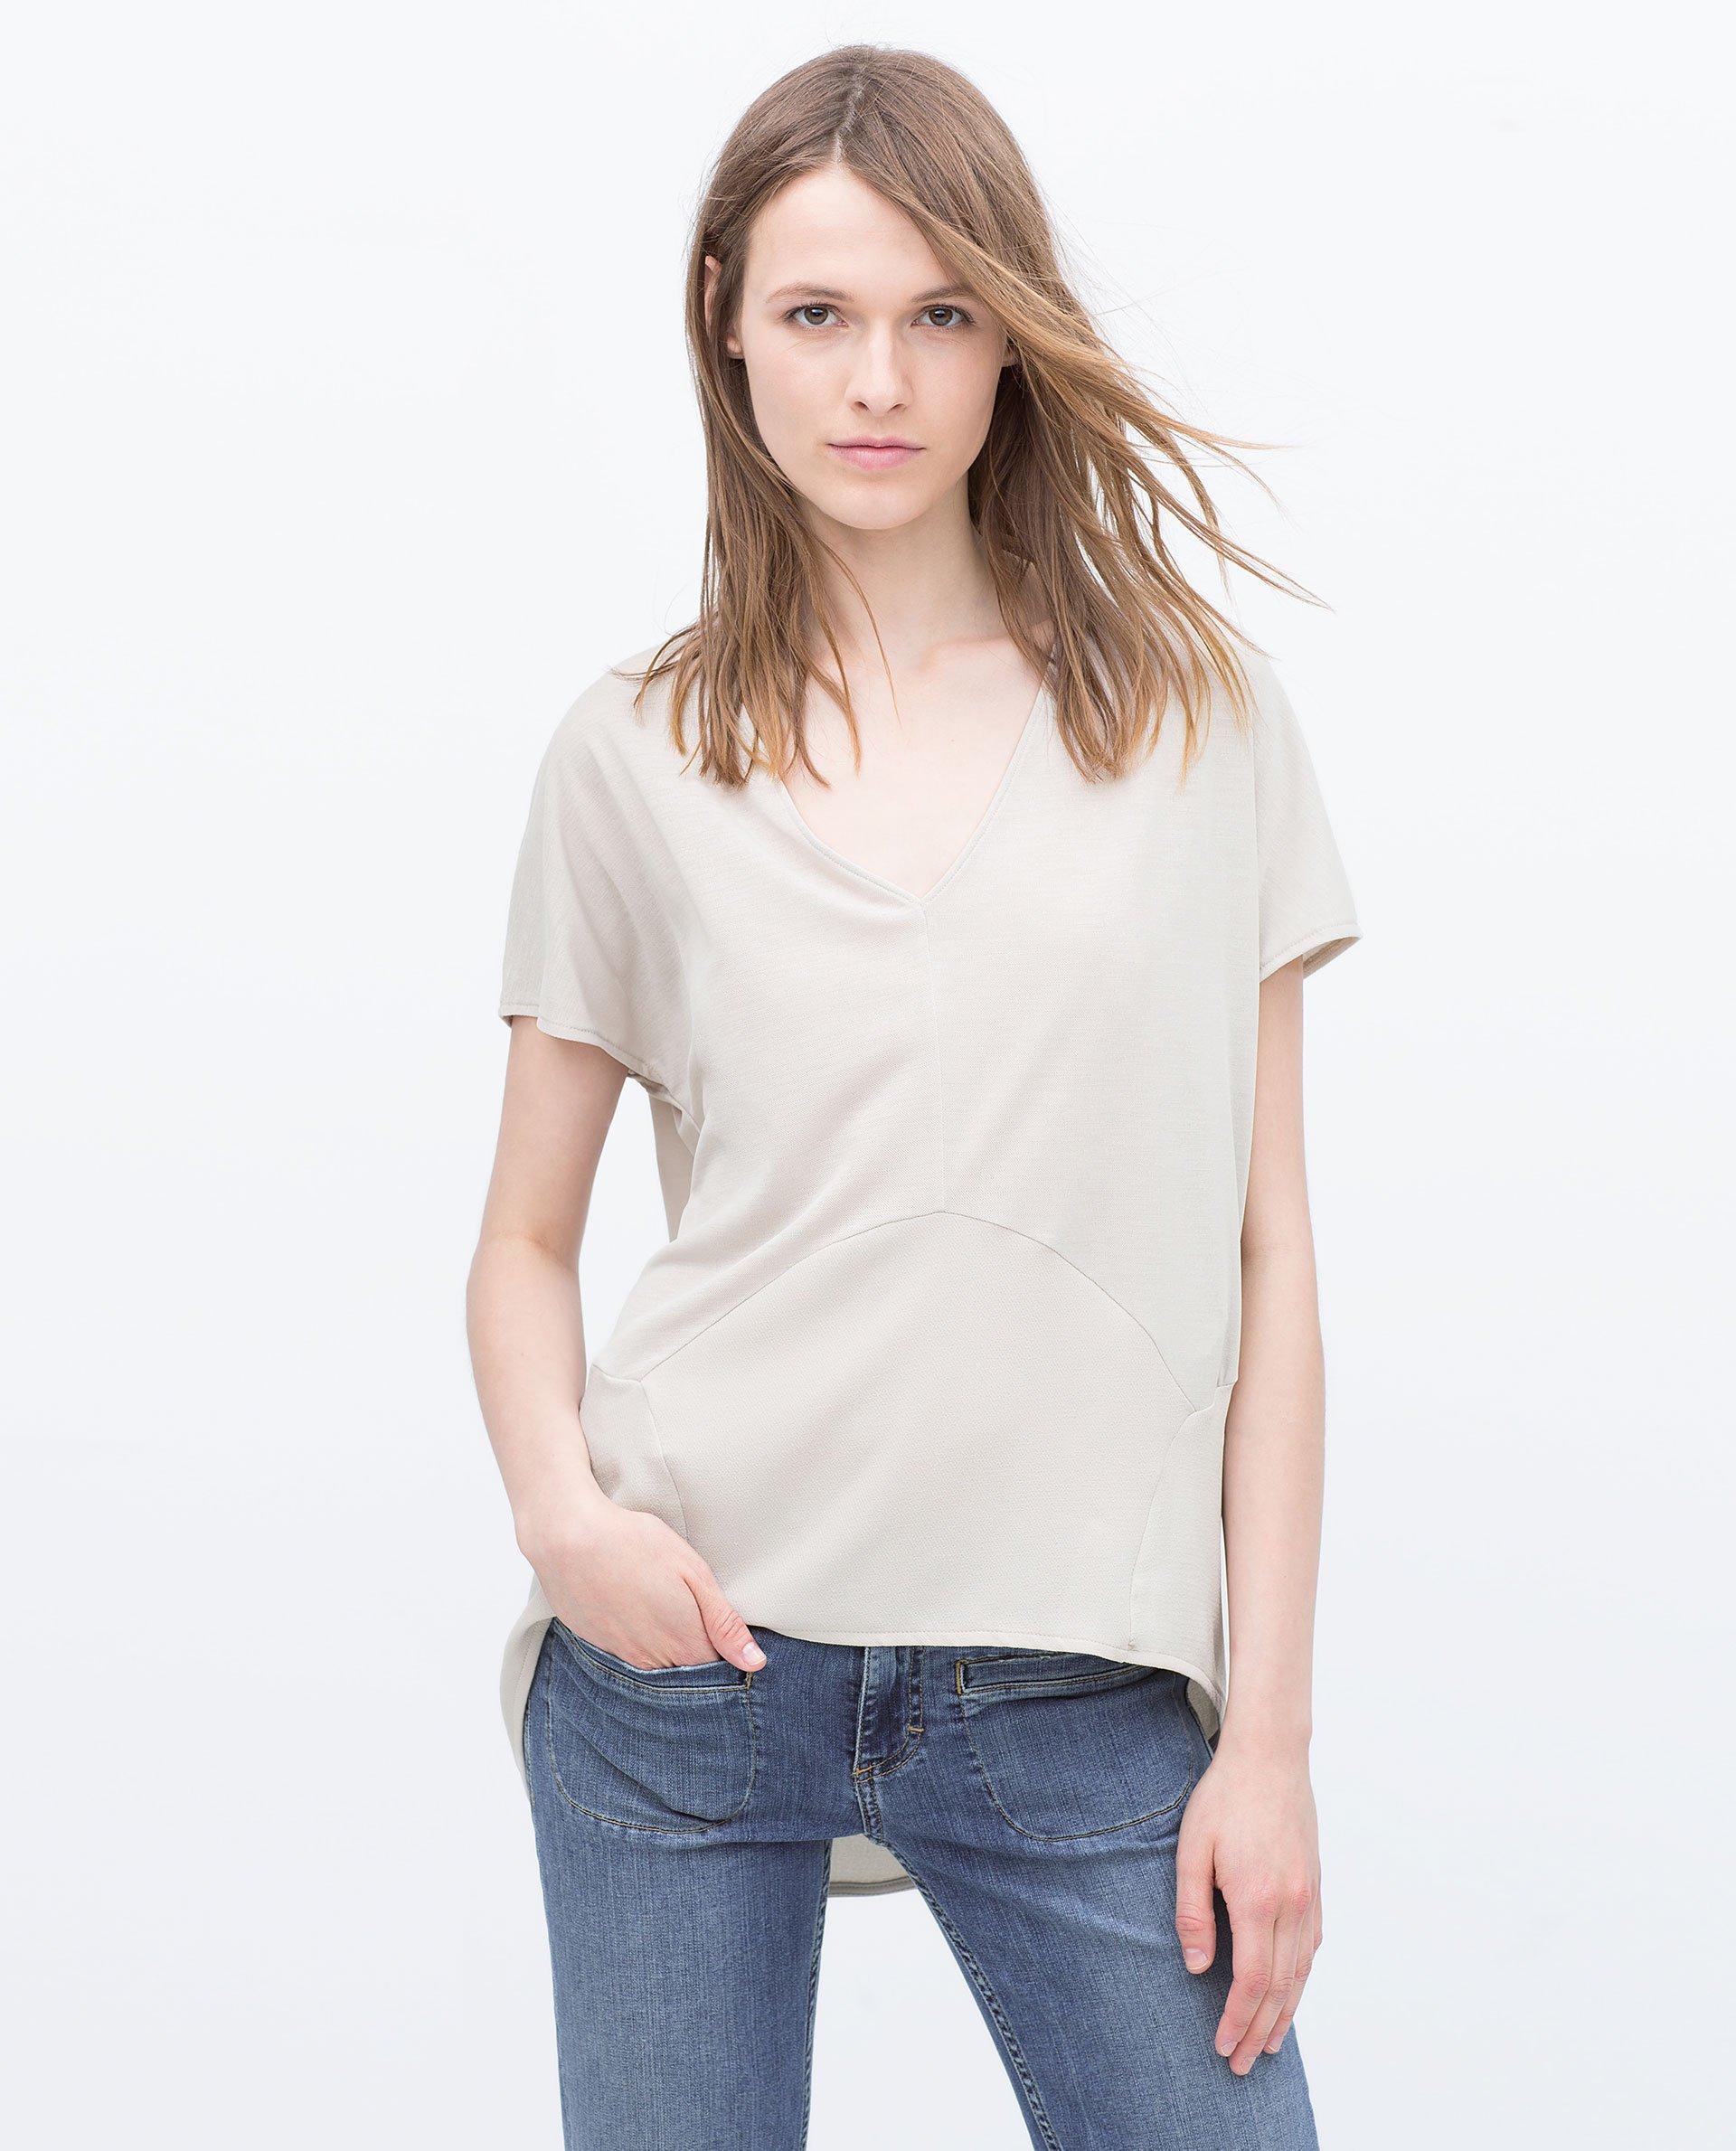 Zara Open Back Blouse 59